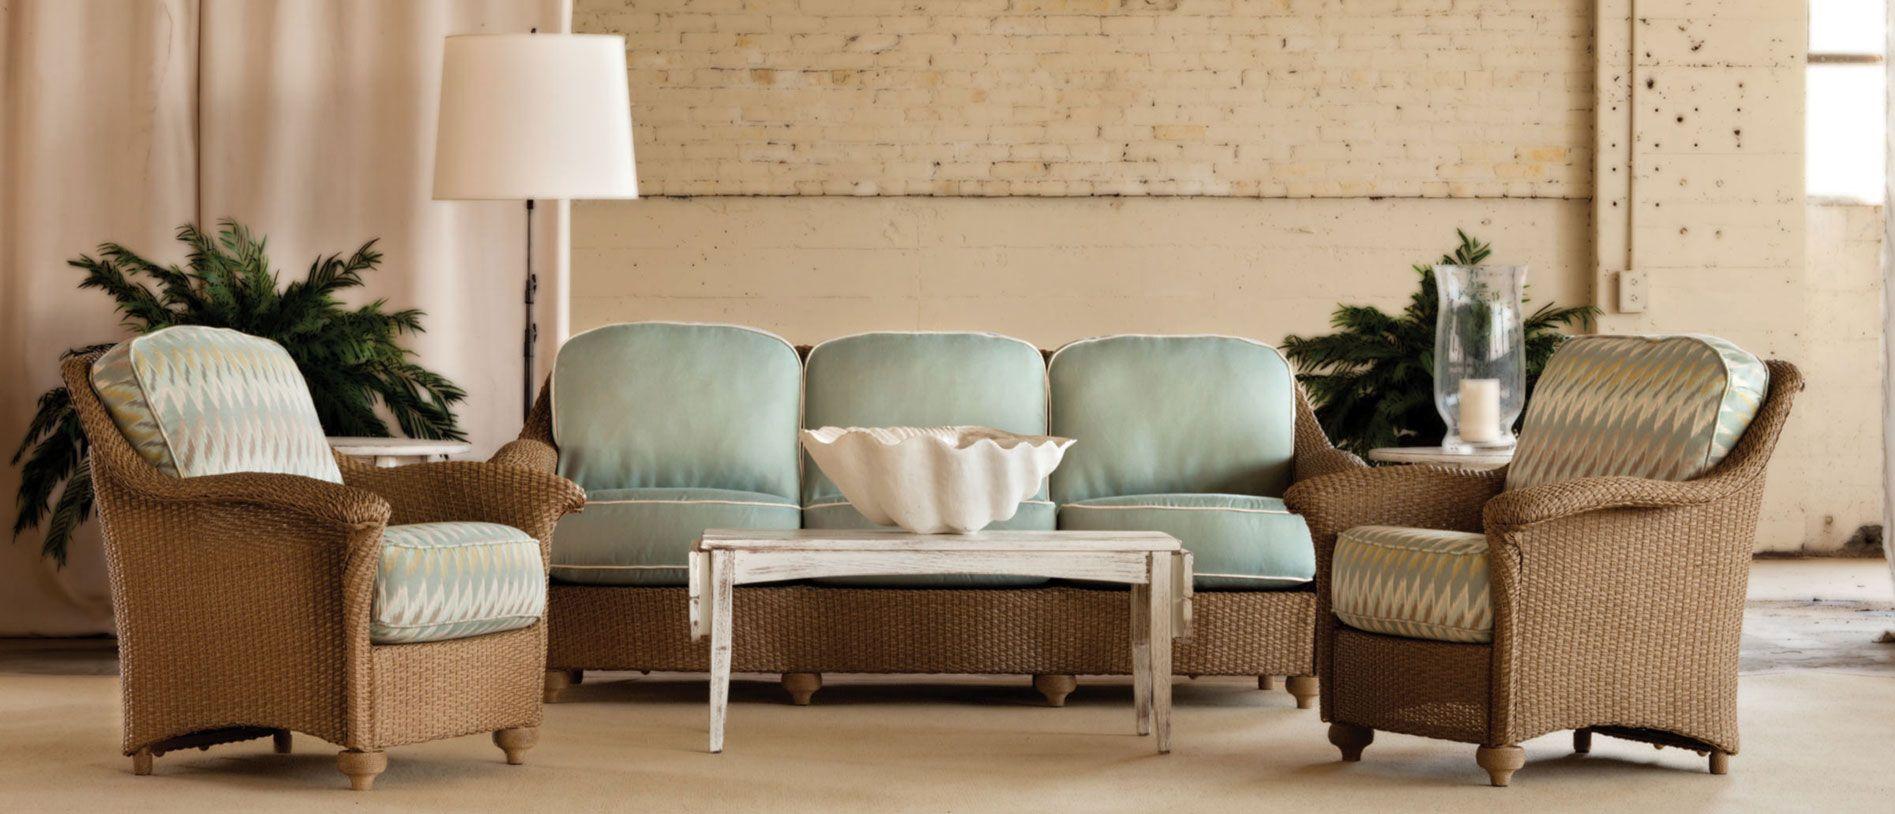 Lloyd Flanders Wicker Furniture Replacement Cushions Wicker